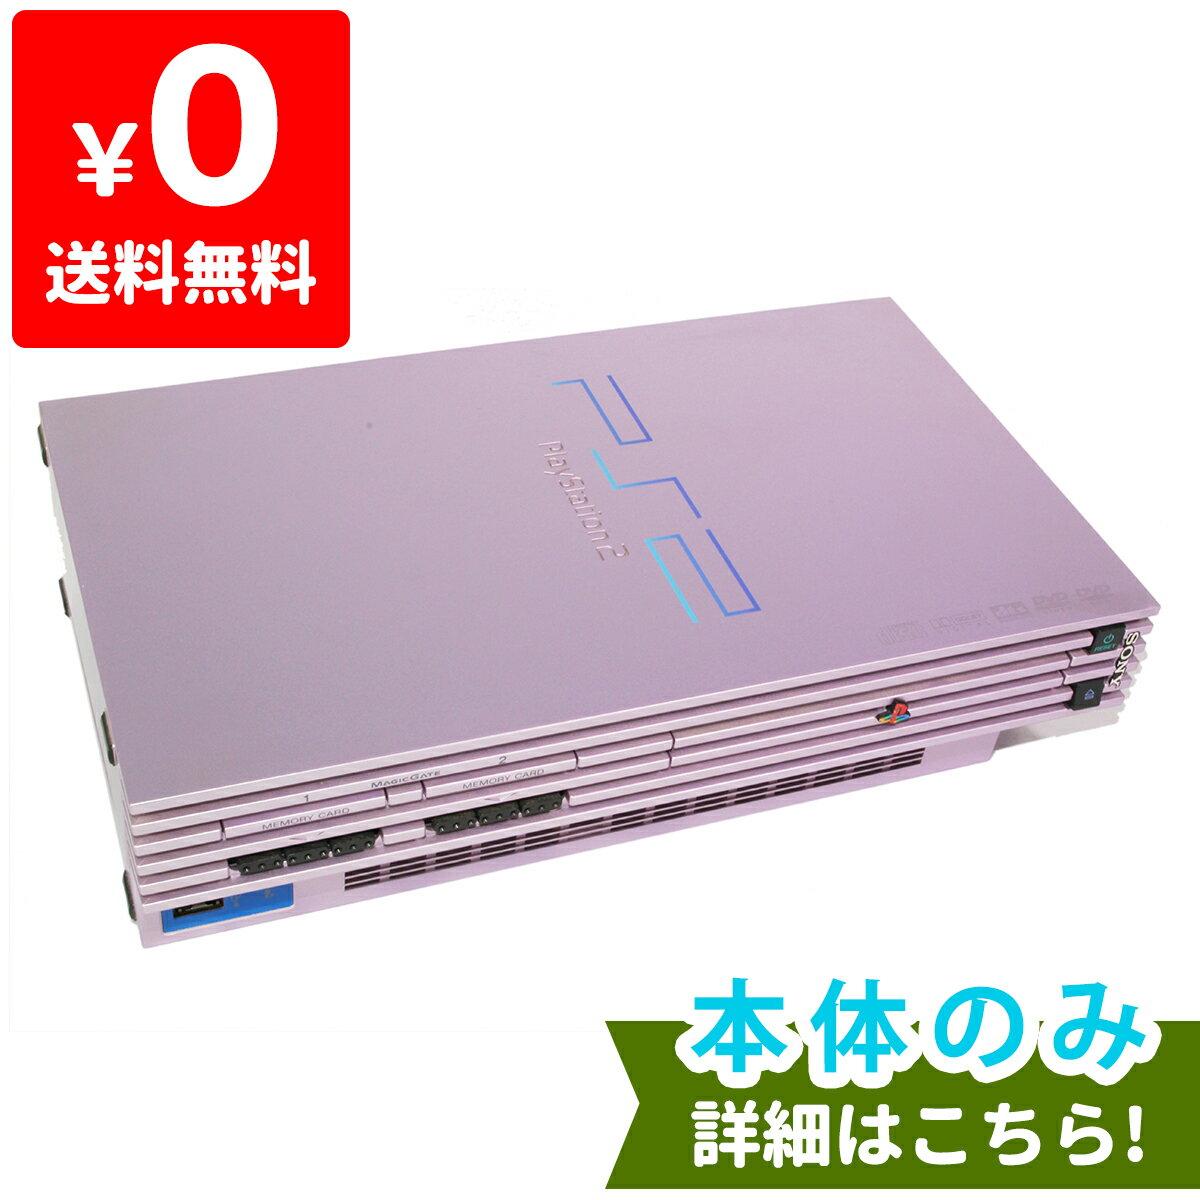 PS2 プレステ2 プレイステーション2 サクラ SCPH-39000 本体のみ 本体単品 PlayStation2 SONY ソニー 中古 4948872410151 送料無料